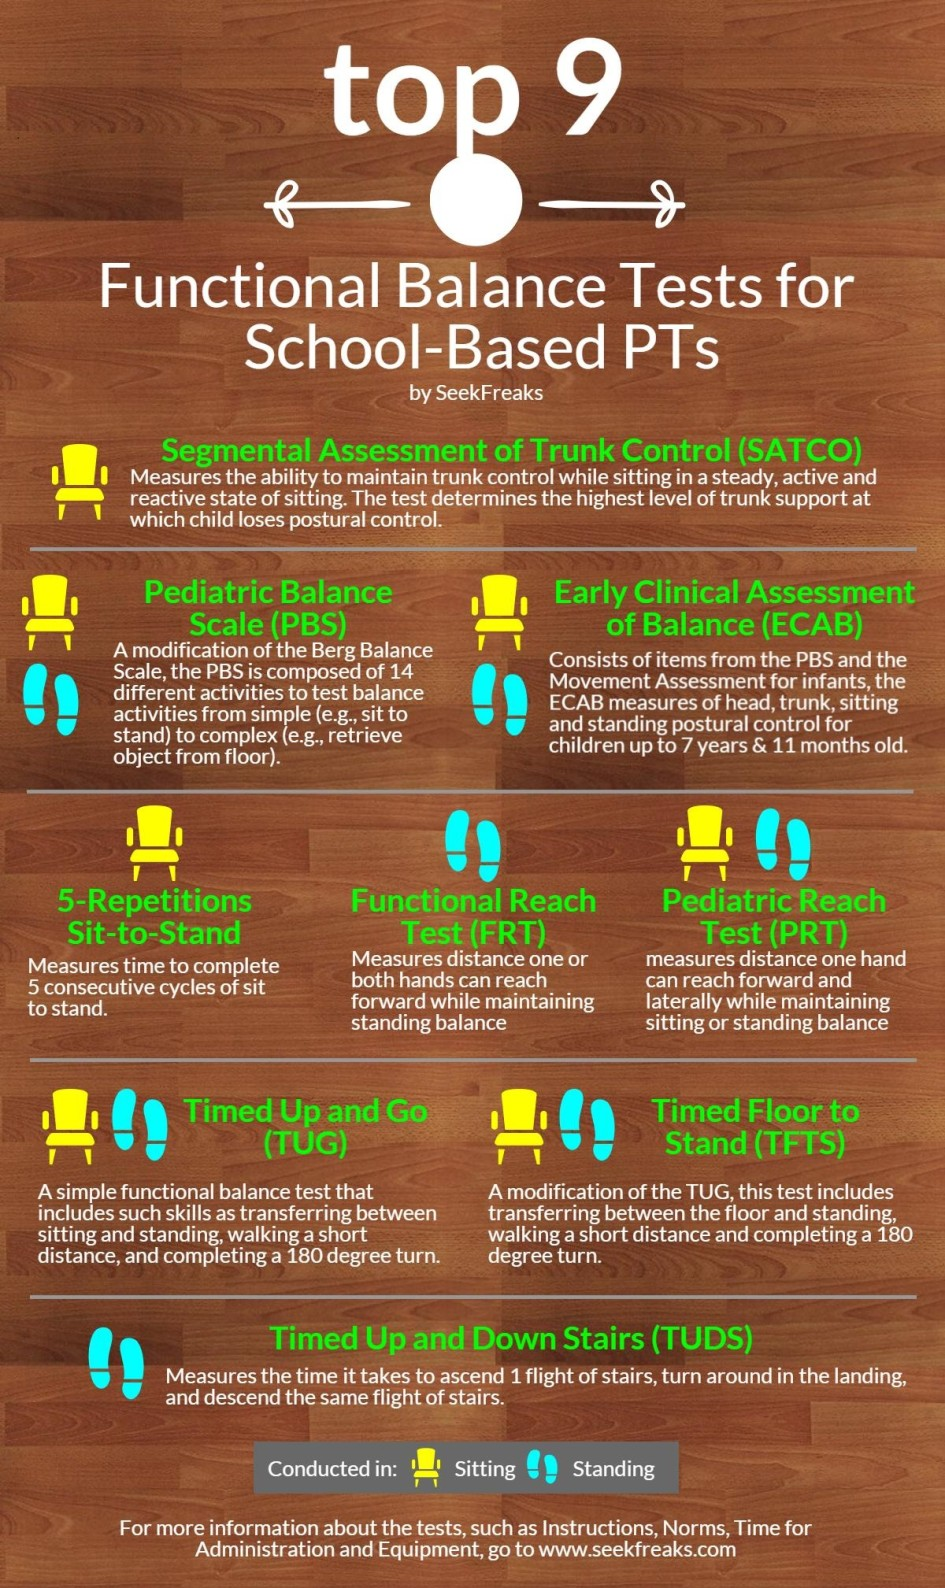 Top 9 Functional Balance Tests for School-Based PTs   SeekFreaks